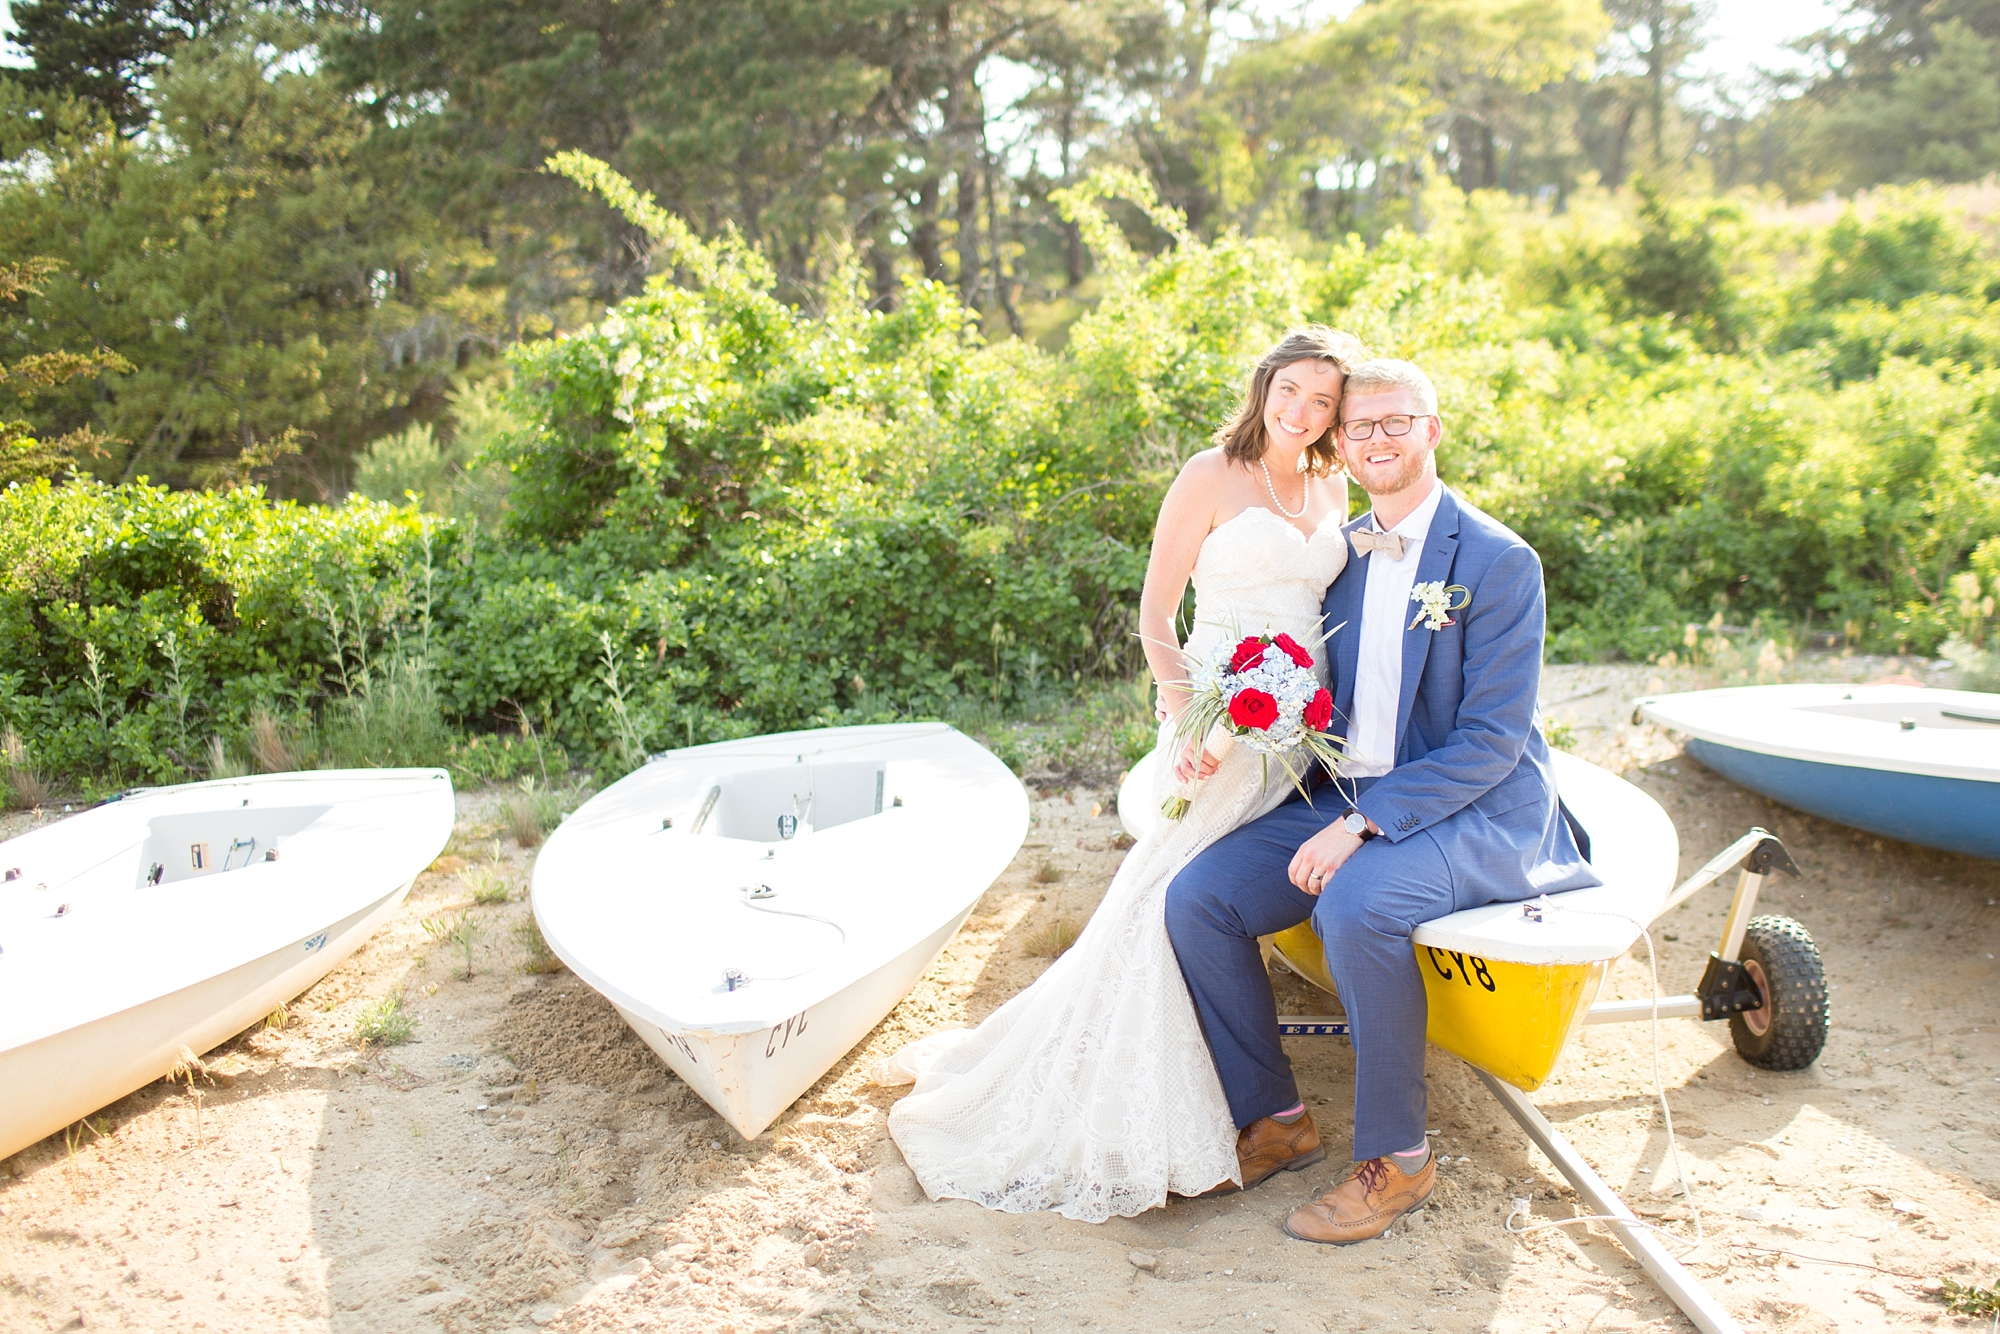 Goodman 3-Bride & Groom Portraits-800_anna grace photography wellfleet cape cod massachusetts destination wedding photographer Chequessett Yacht and Country Club wedding photo.jpg